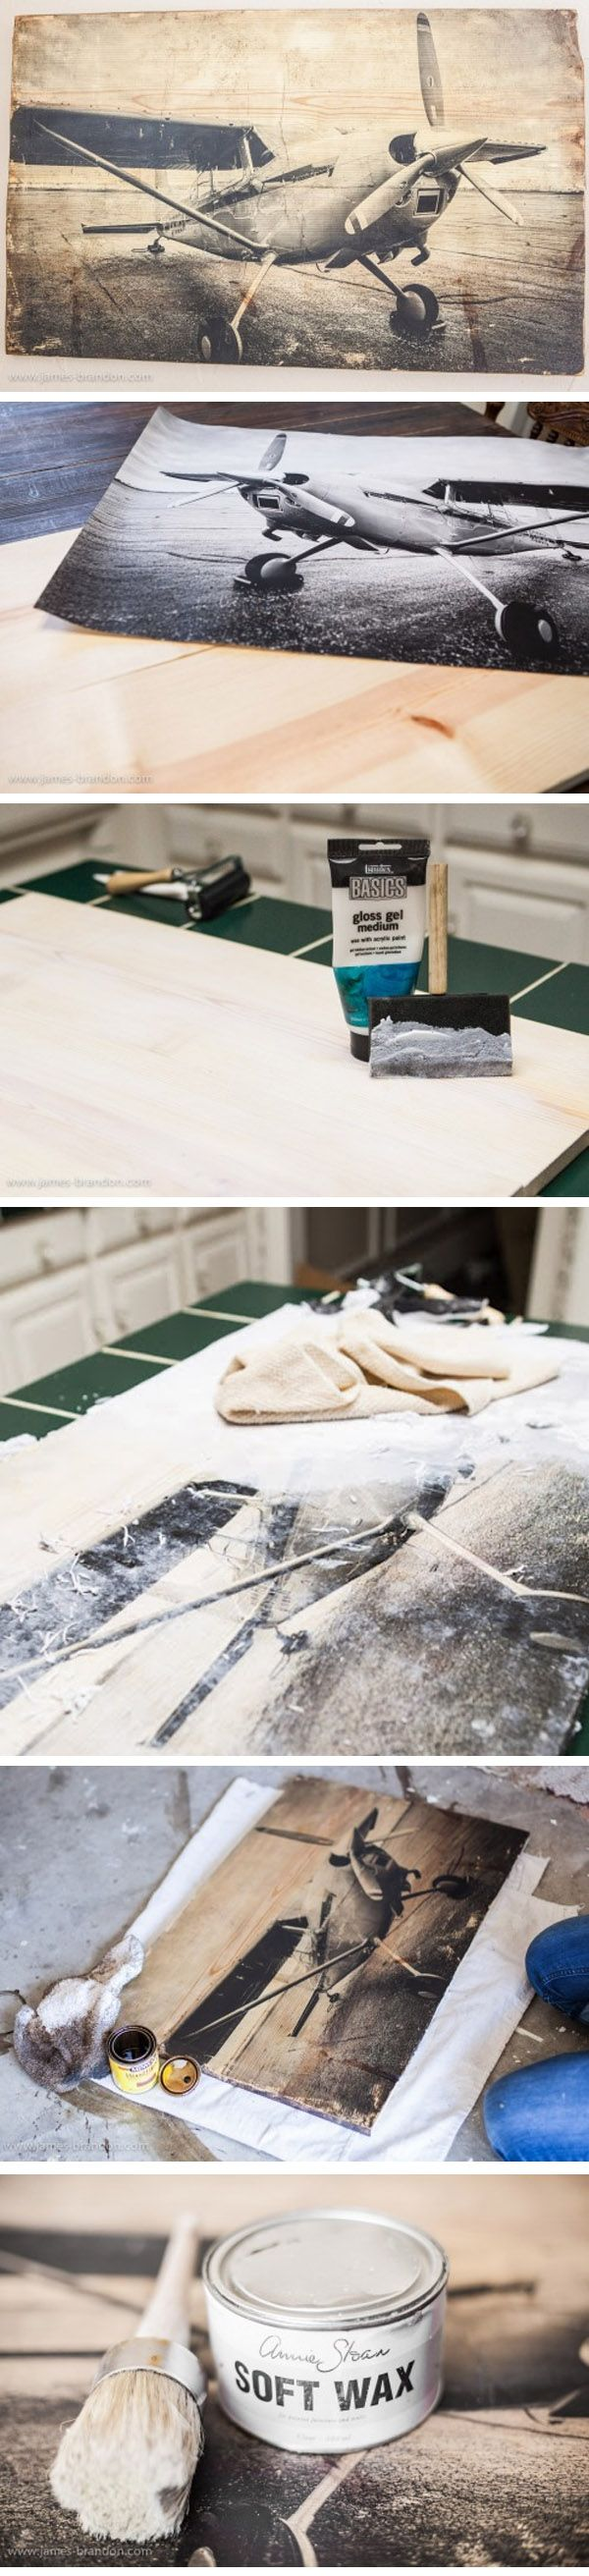 Overfør laserprint fotos til træ (Laser Printed Photo transfer to Wood Panel  :: laser printed photo, wood panel, acrylic gel medium, brush, pigment ink and wax. or mod podge ( detail:: http://www.katiesrosecottageblog.com/2012/06/photo-transfer-to-wood-tutorial.html ))